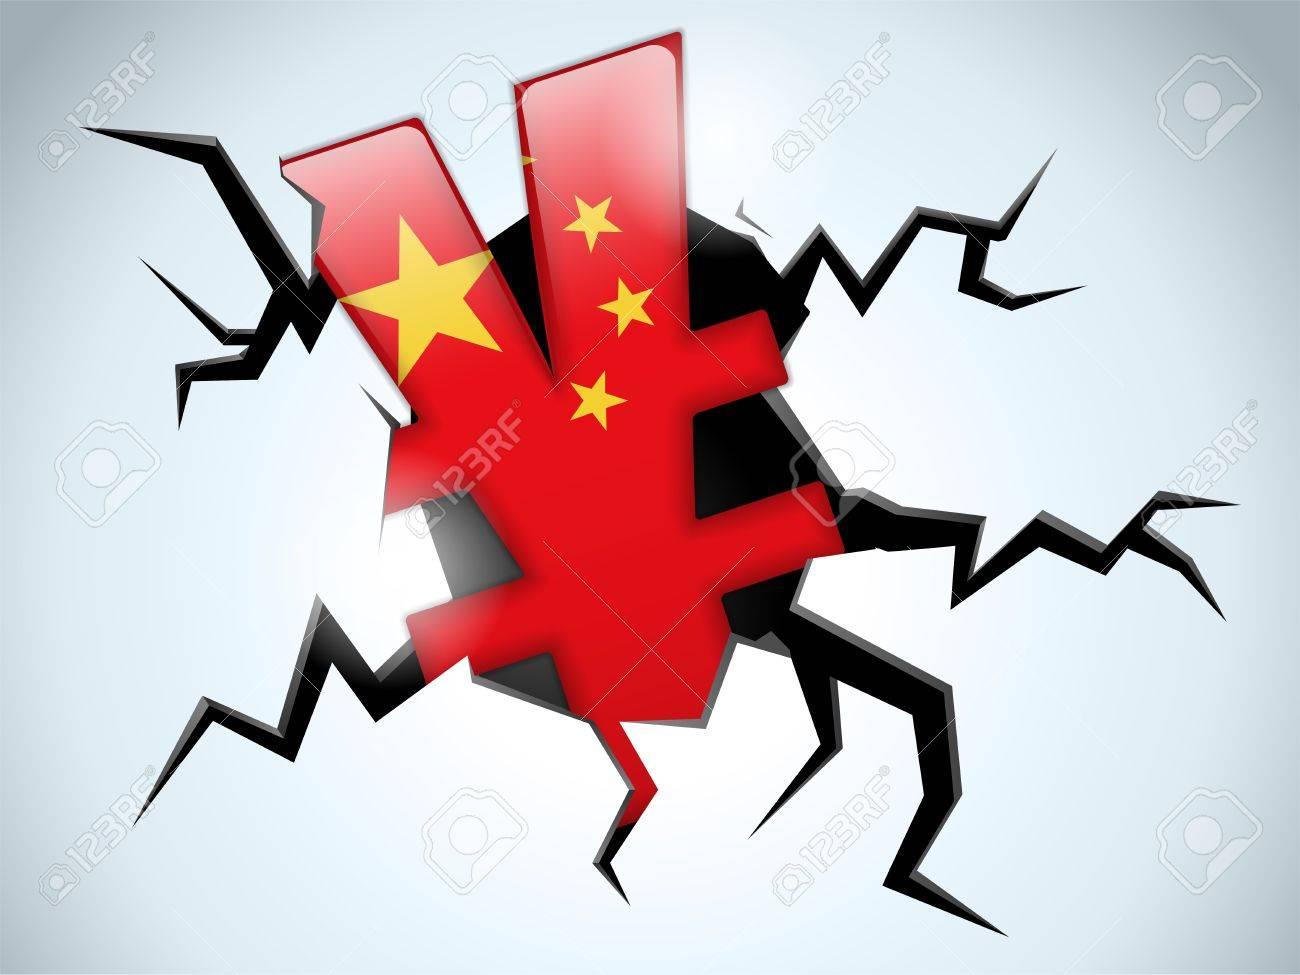 Vector - Yuan Yen Money Crisis China Flag Crack on the Floor Stock Vector - 16189049